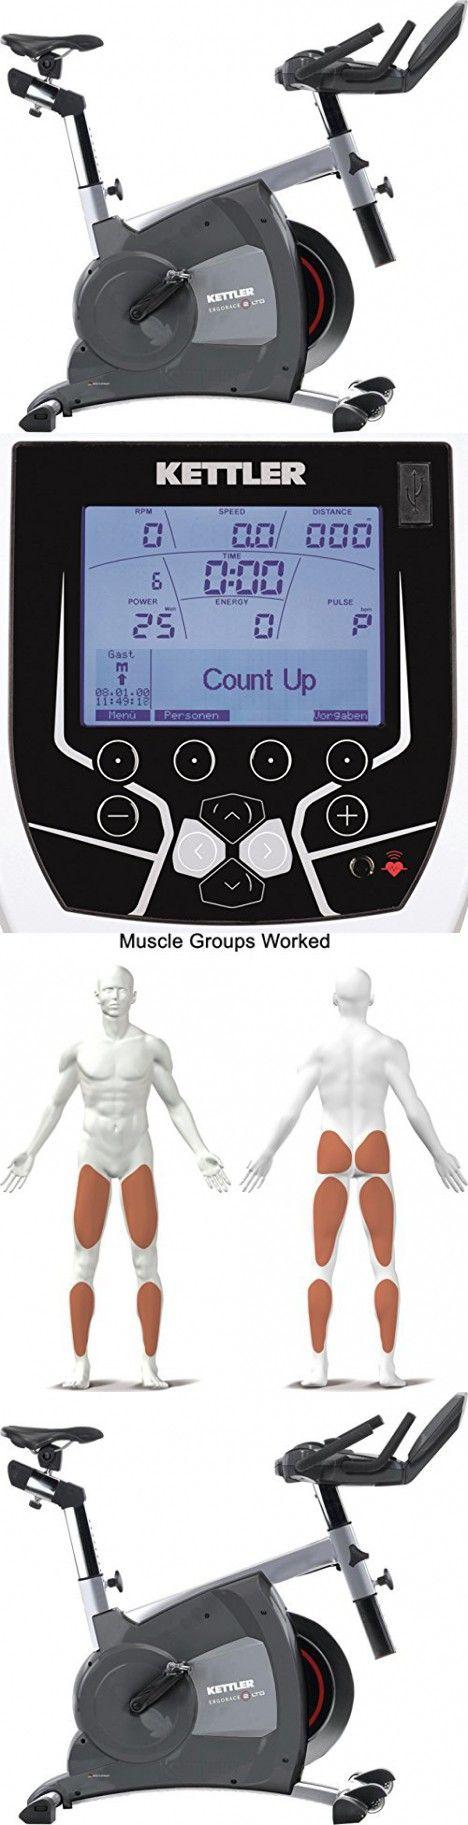 Kettler Home Exercise/Fitness Equipment: ERGO RACE II LTD Indoor Cycling Speed Trainer